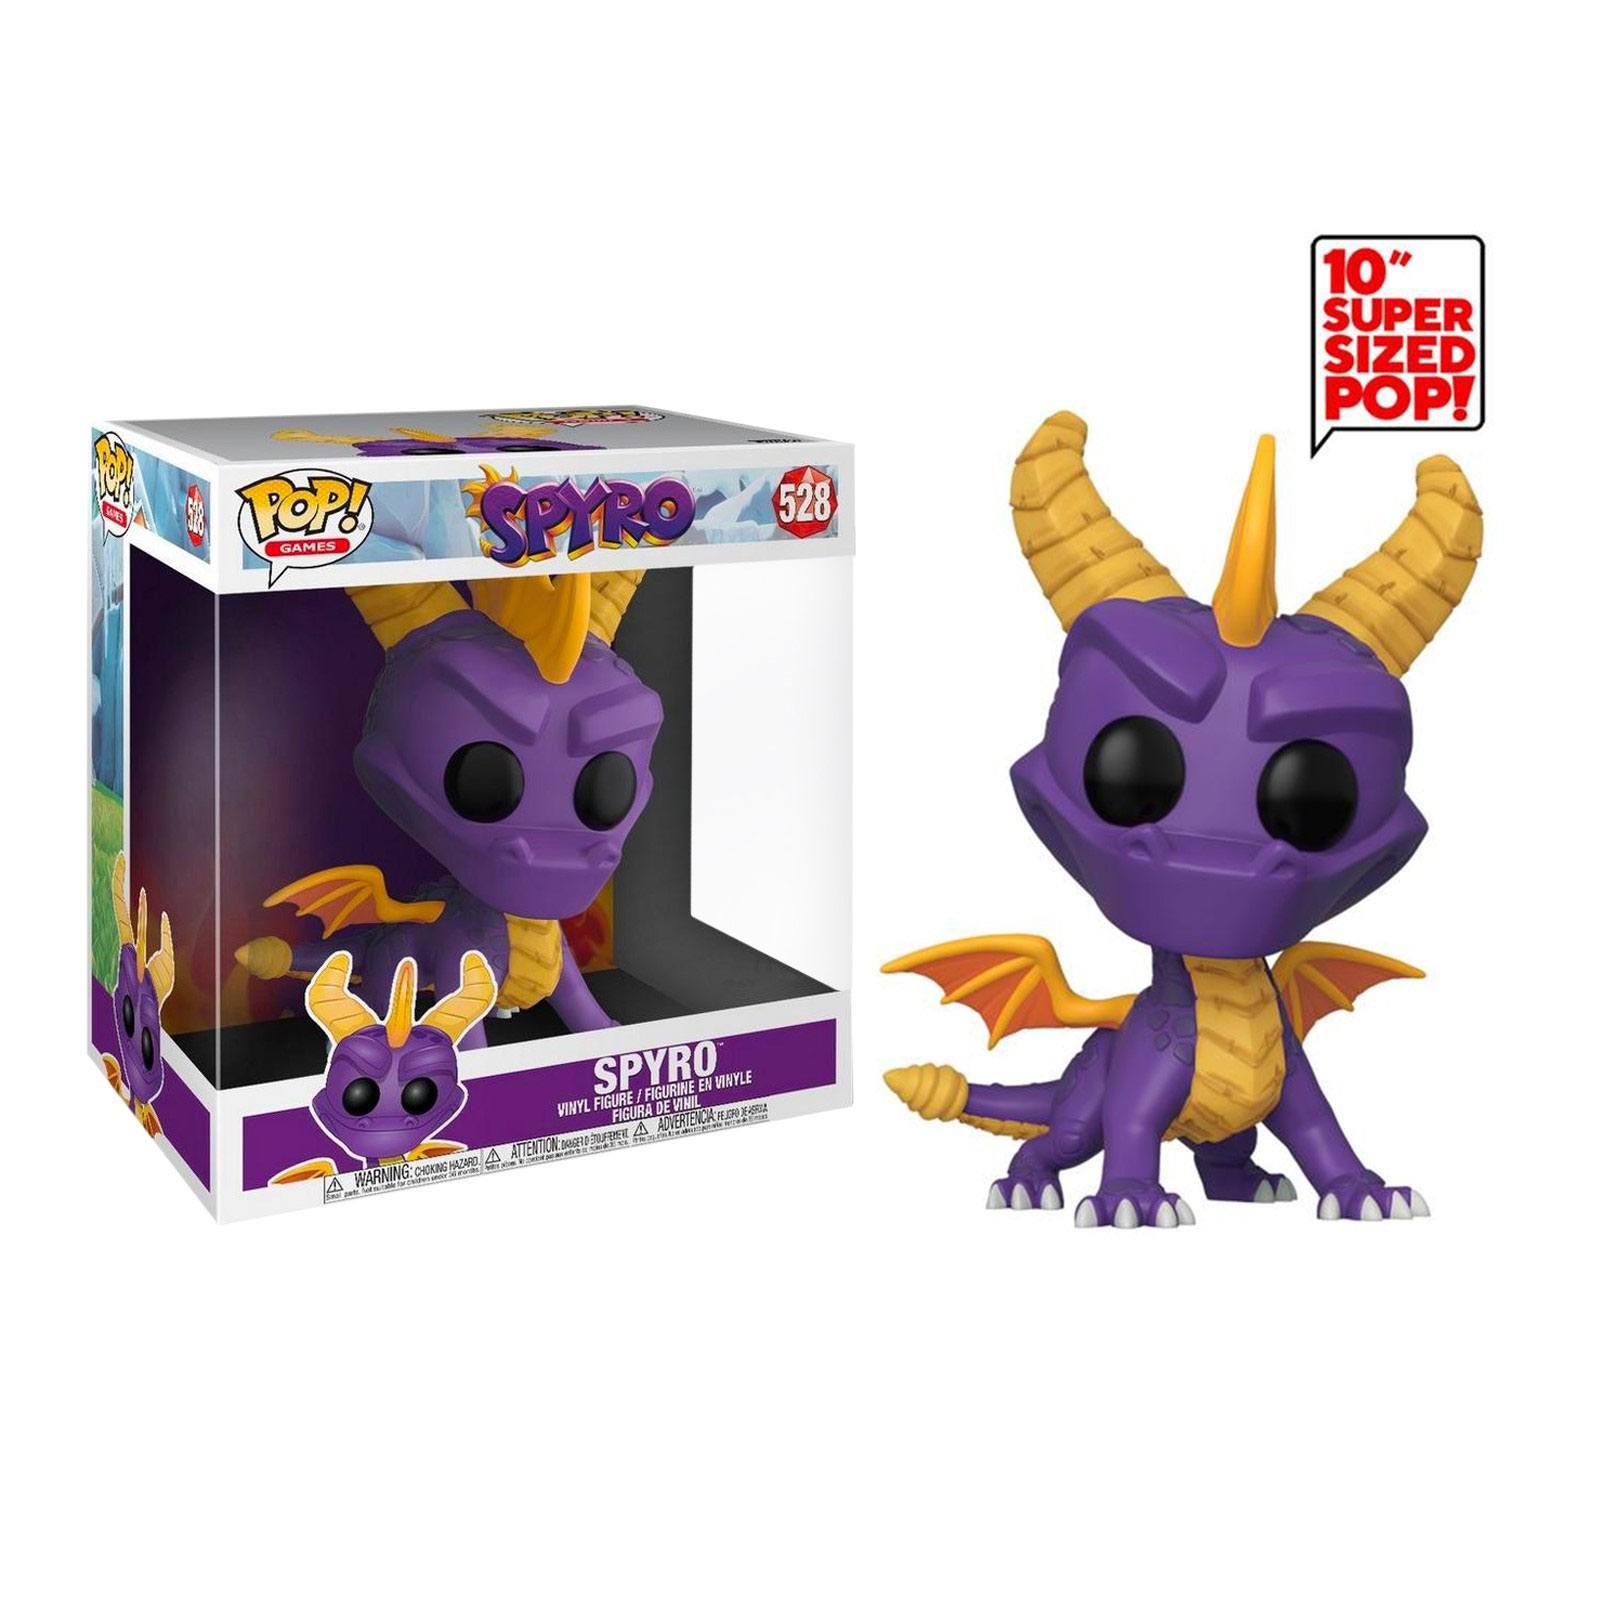 Spyro the Dragon Super Sized POP! Games Vinyl Figure Spyro 25 cm